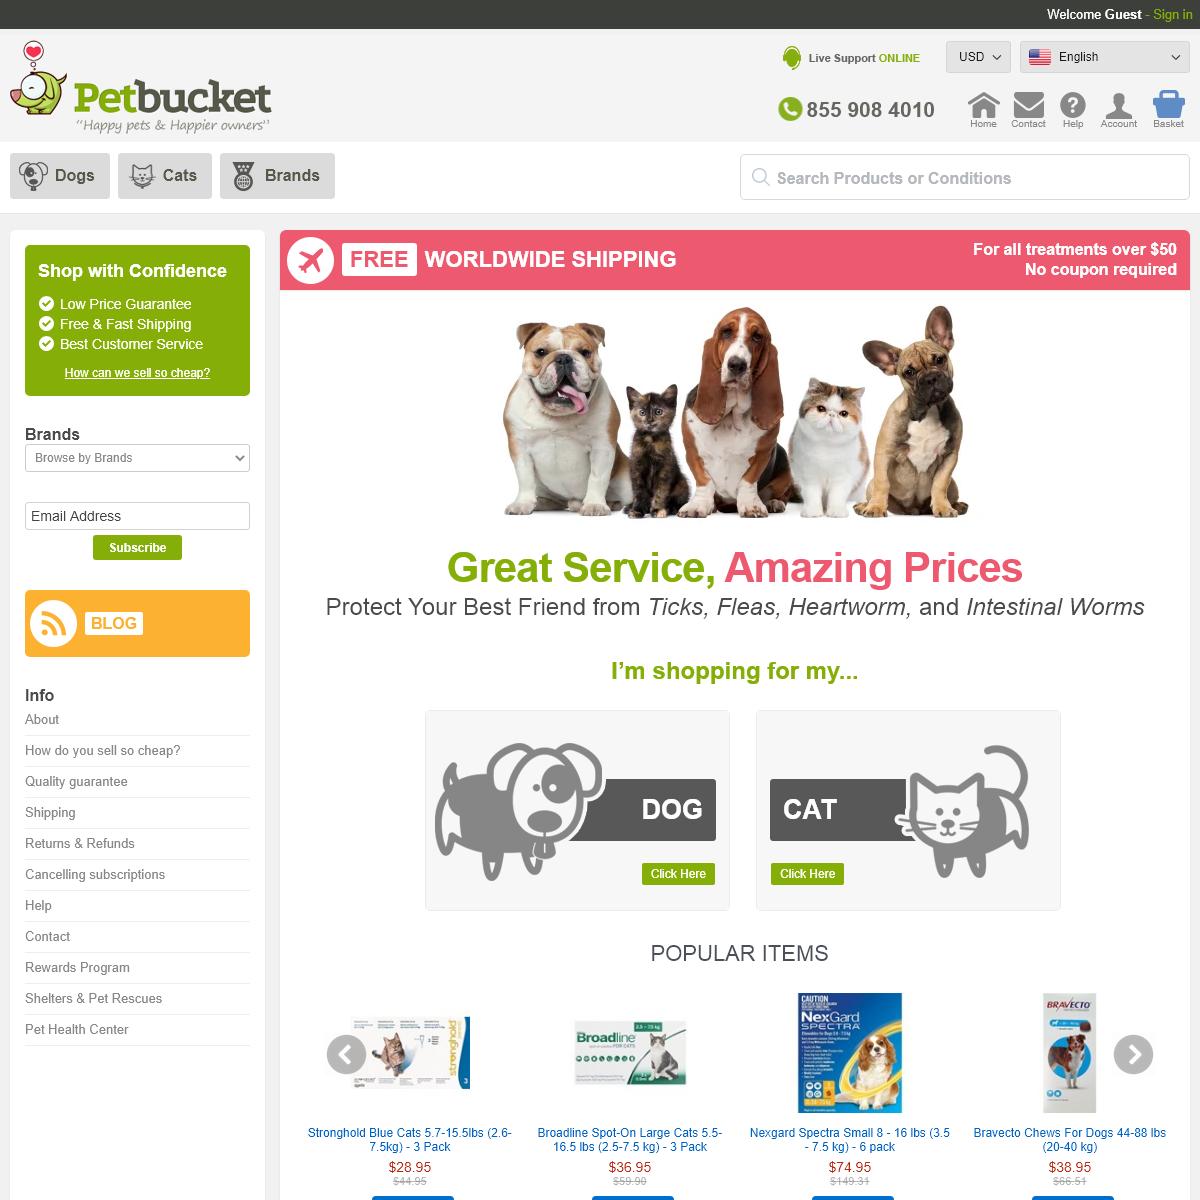 Cheap flea, tick treatments, heart & intestinal worming for dogs & cats - PetBucket